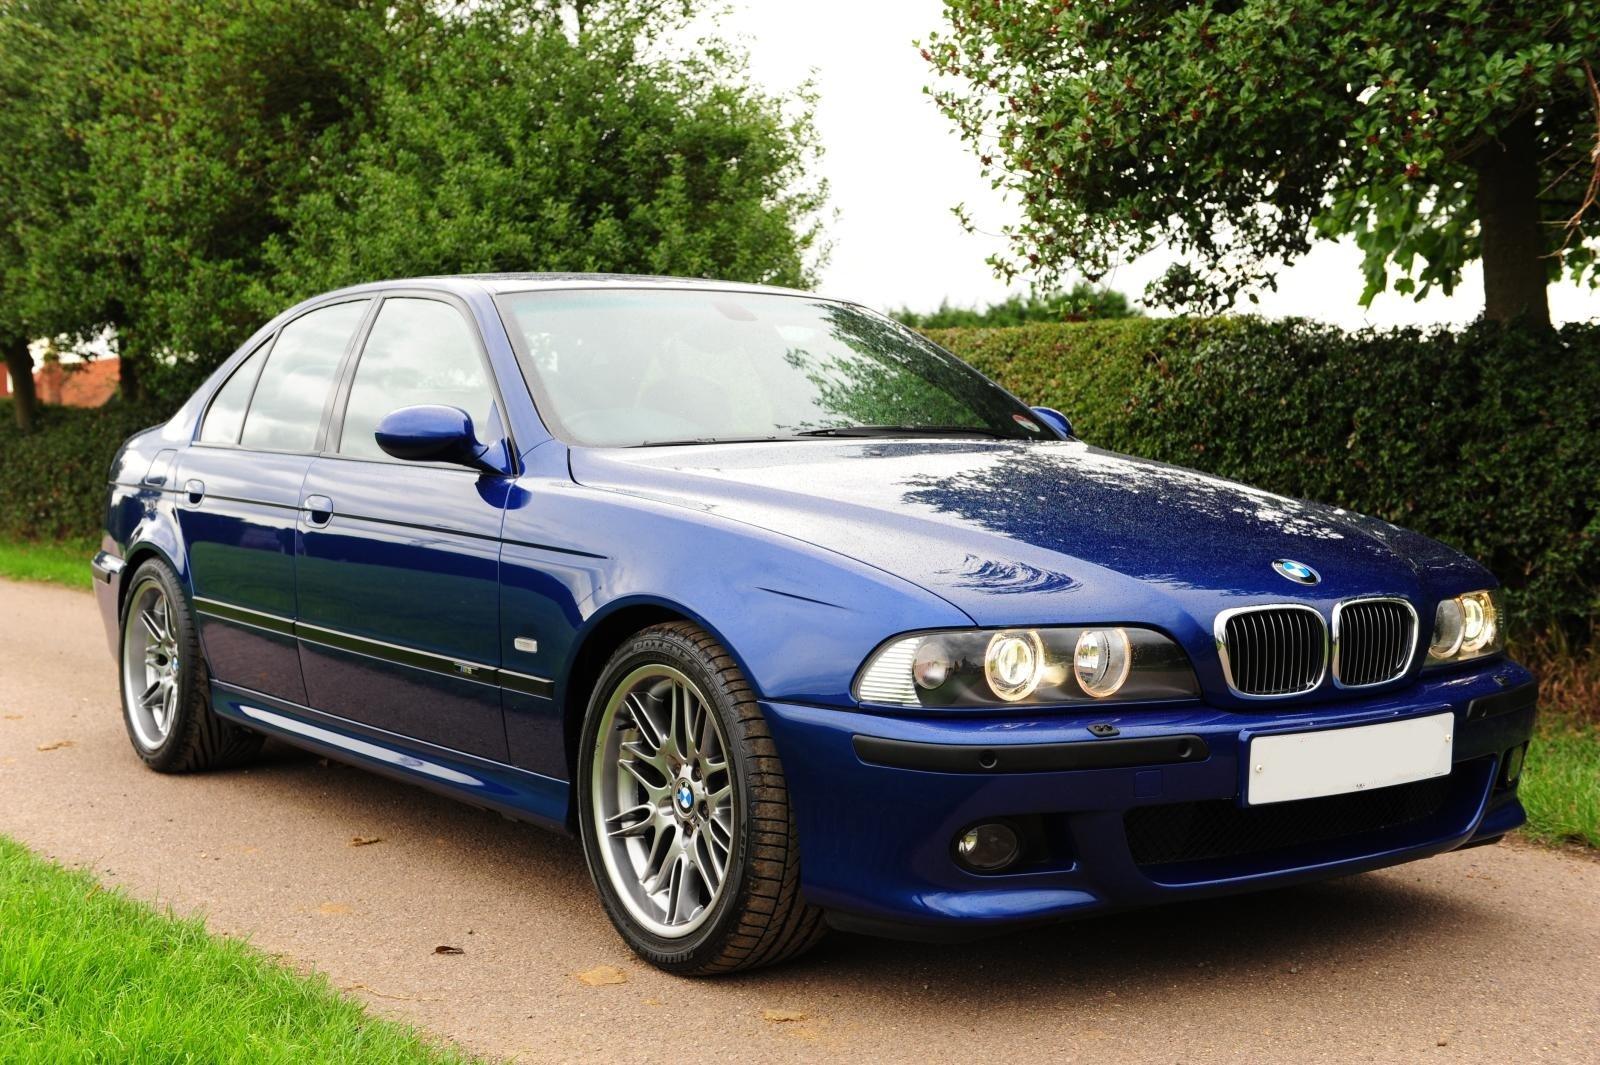 BMW_M5_E39 sedan